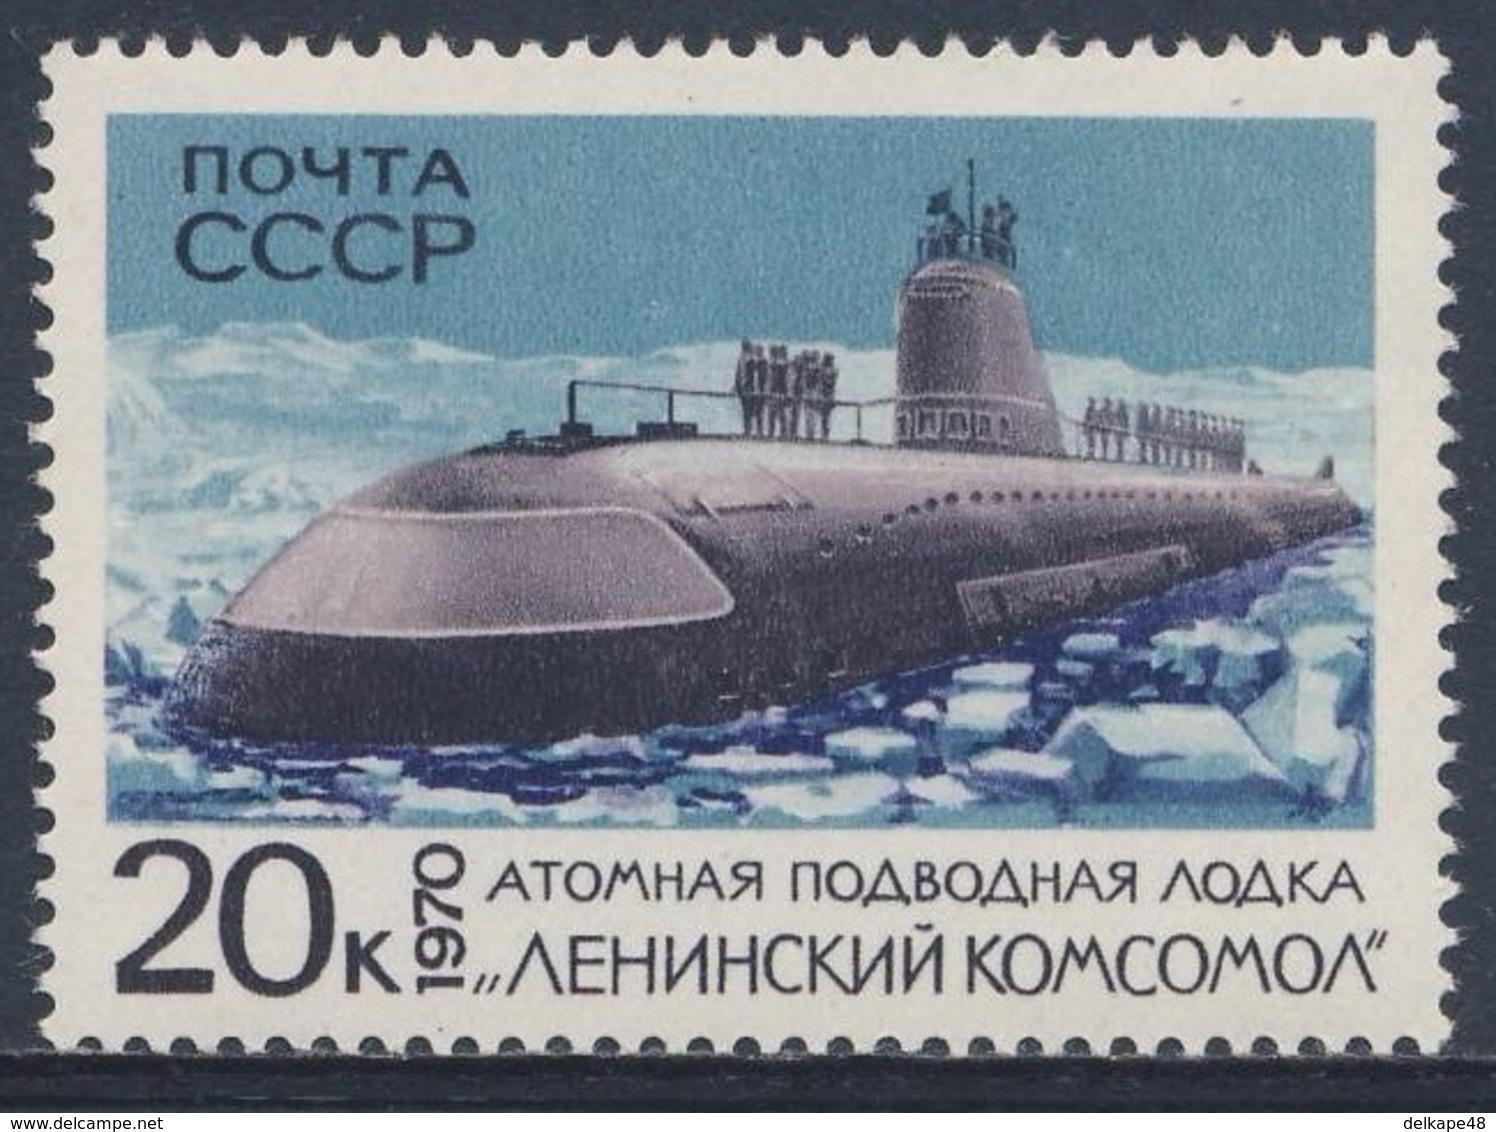 "Soviet Unie CCCP Russia 1970 Mi 3785 SG 3847 ** Nuclear Submarine ""Leninsky Komsomol"" / Atom-Unterseeboot - Duikboten"